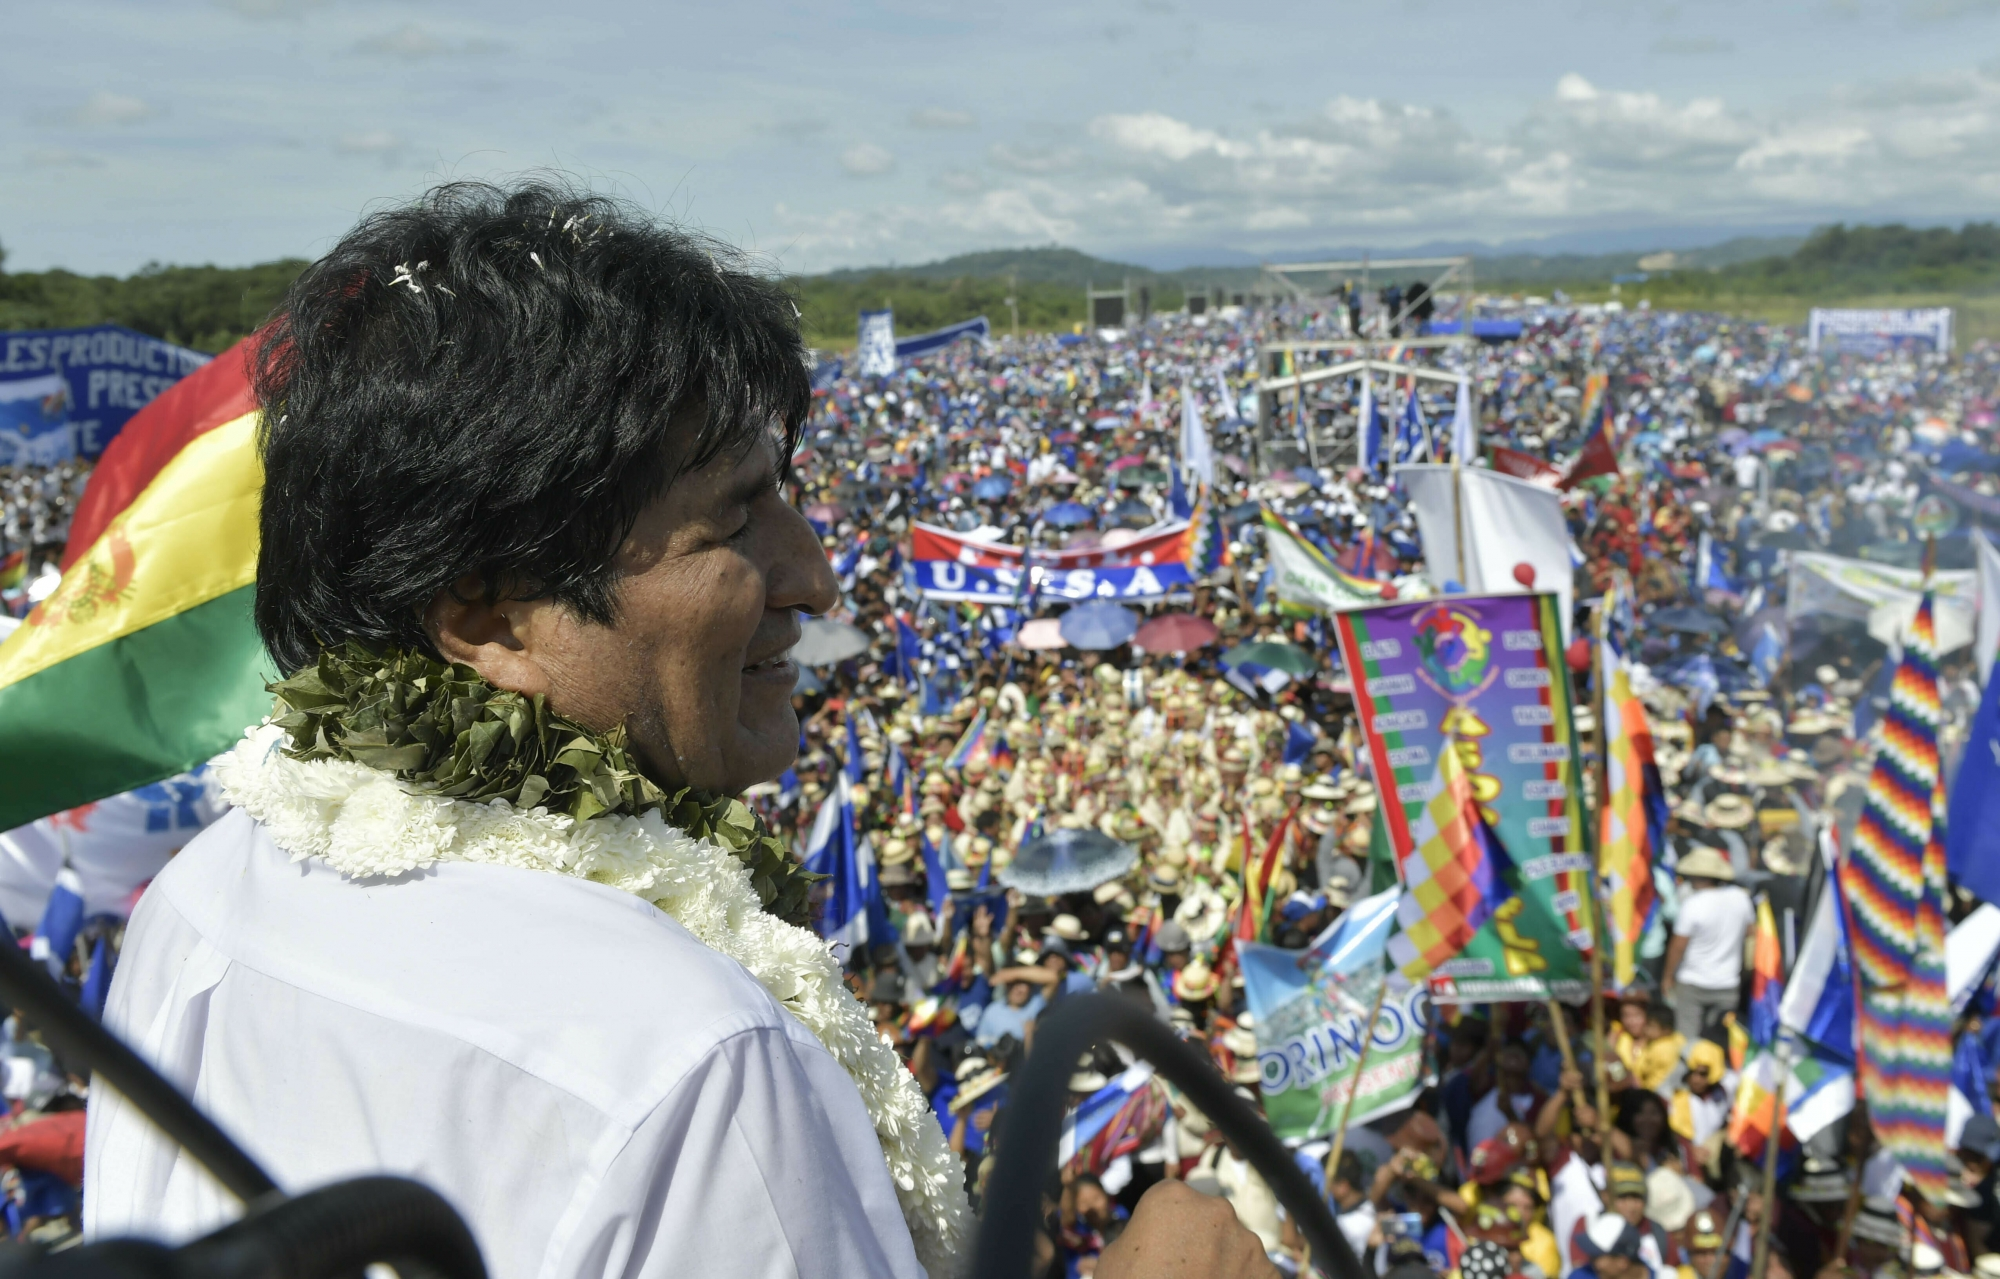 Bolivia's Morales Begins Bid For 4th Term Despite